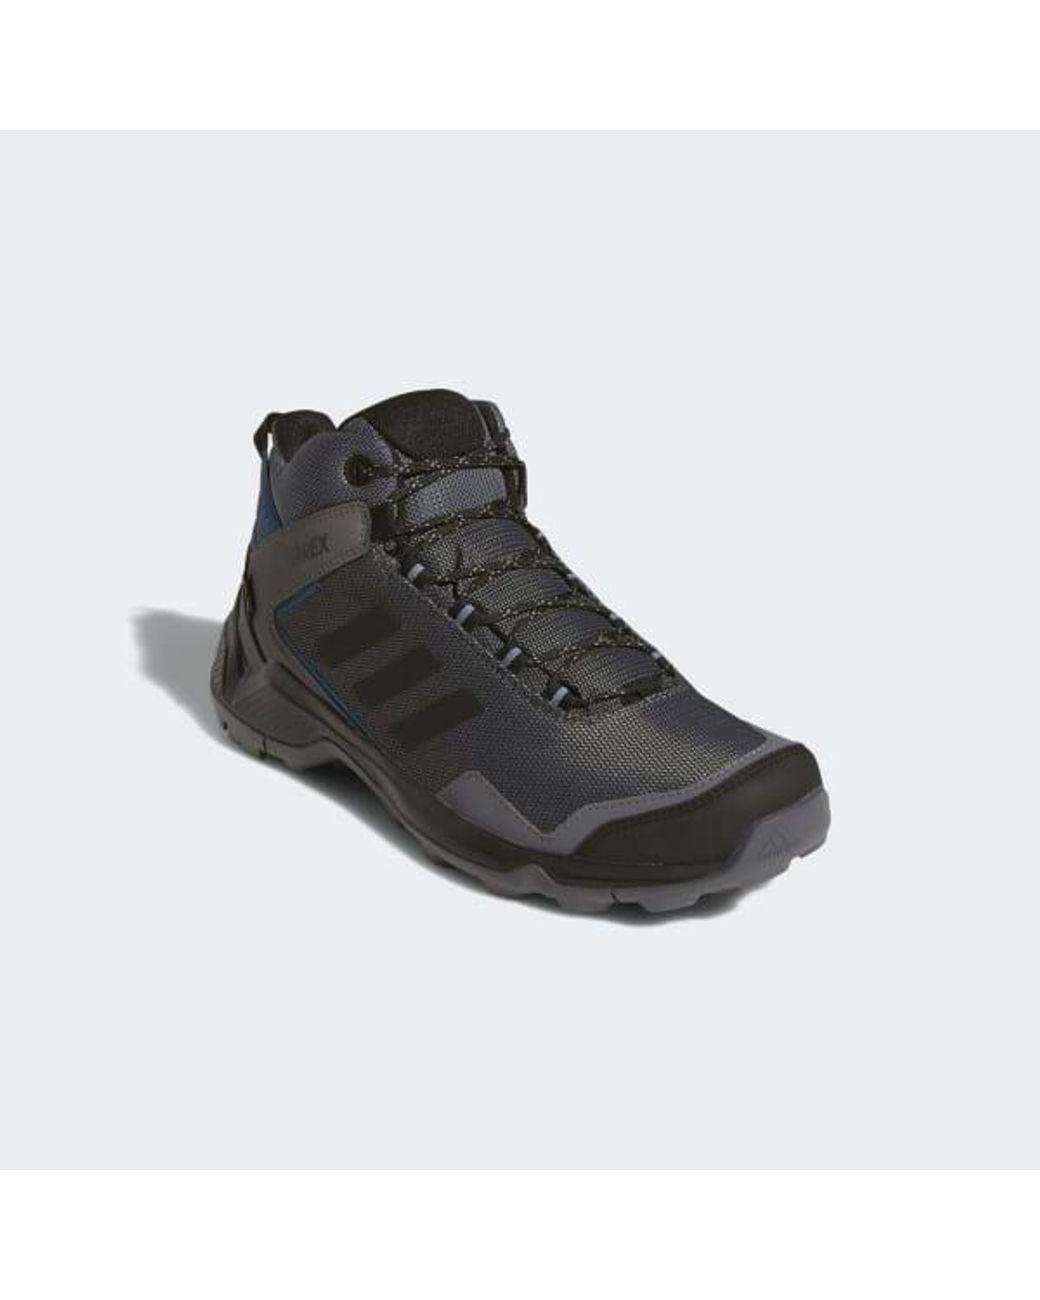 adidas Terrex Entry Hiker Mid Gore tex Shoes in Grey (Gray